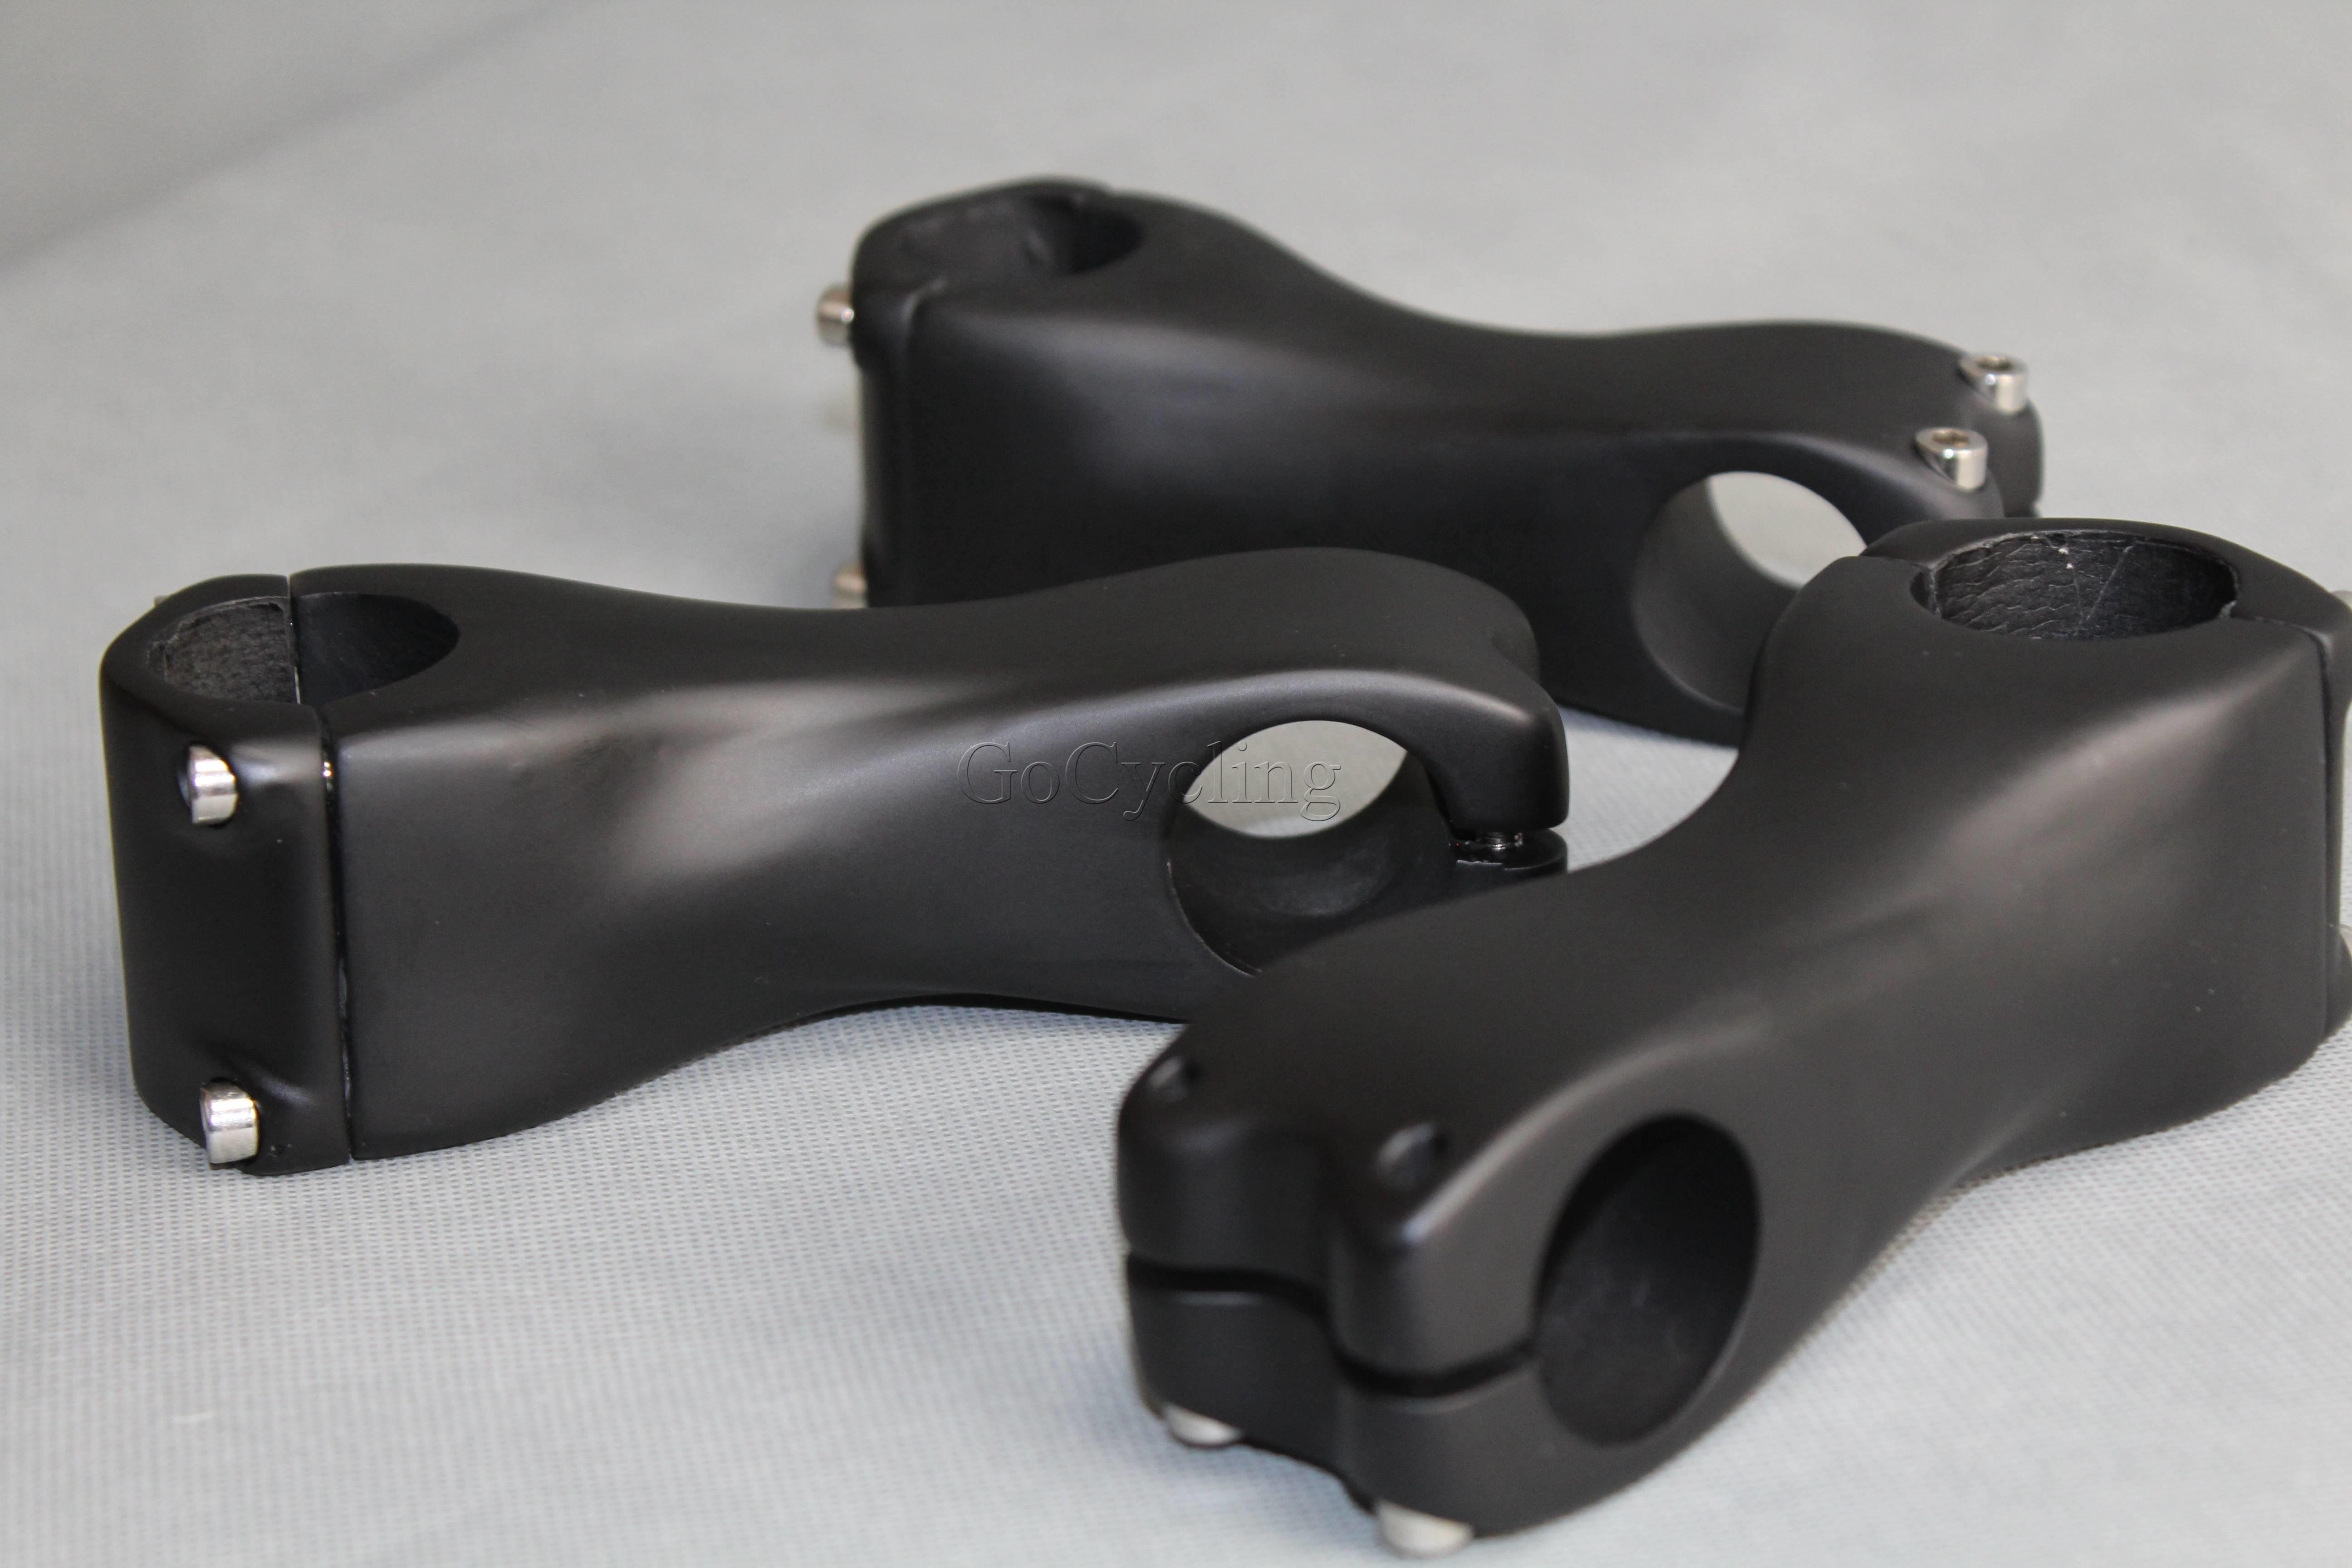 MTB الطريق دراجة الكربون الجذعية ألياف الكربون الجذعية الناهض 31.8mm الأحجام 90 100 110 120 130MM زاوية 6